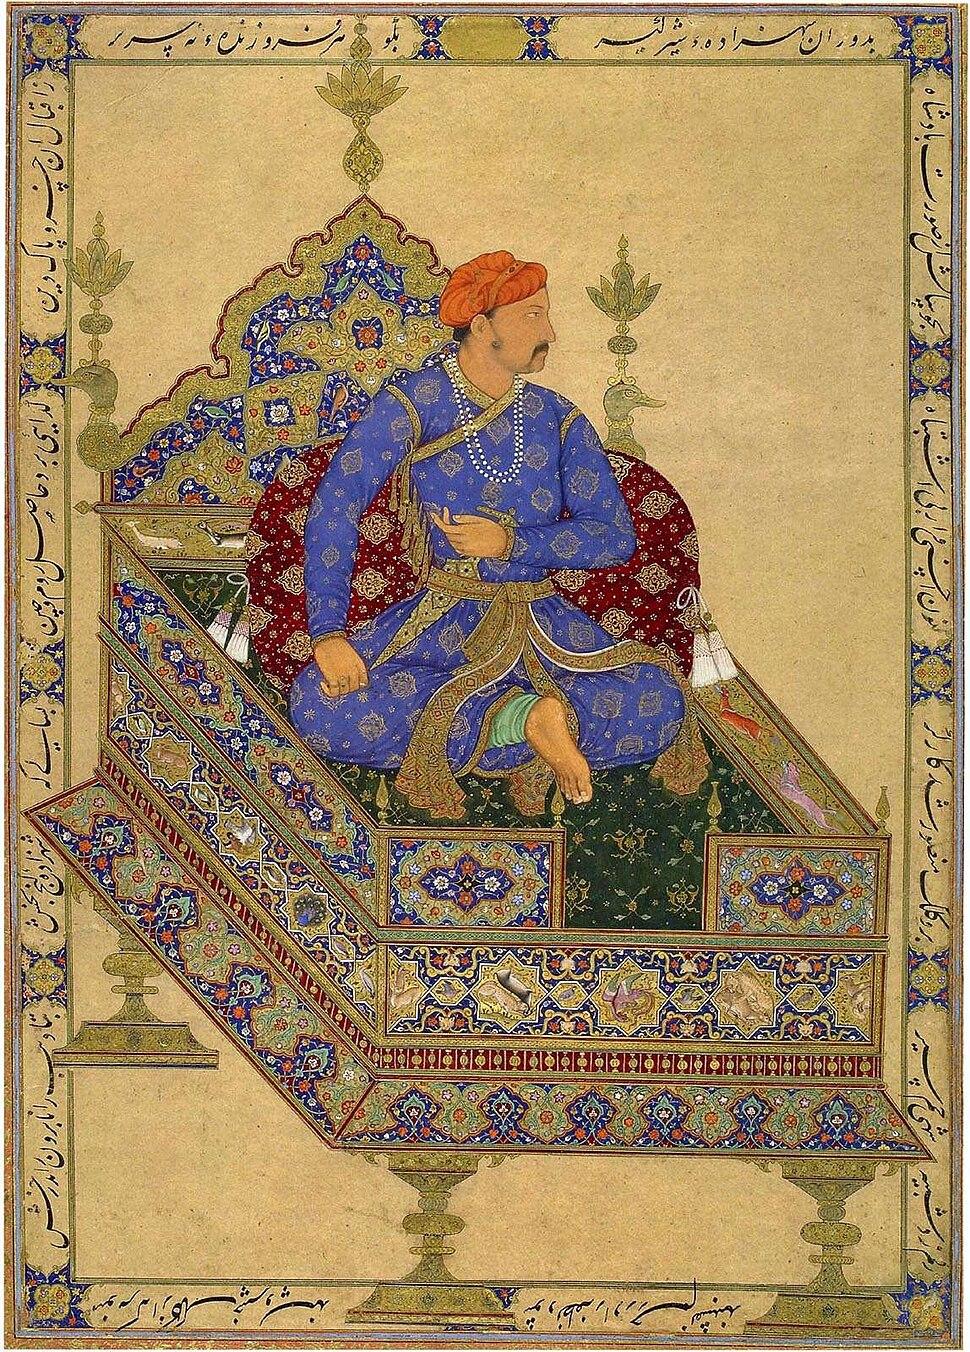 Prince Salim, the future Jahangir